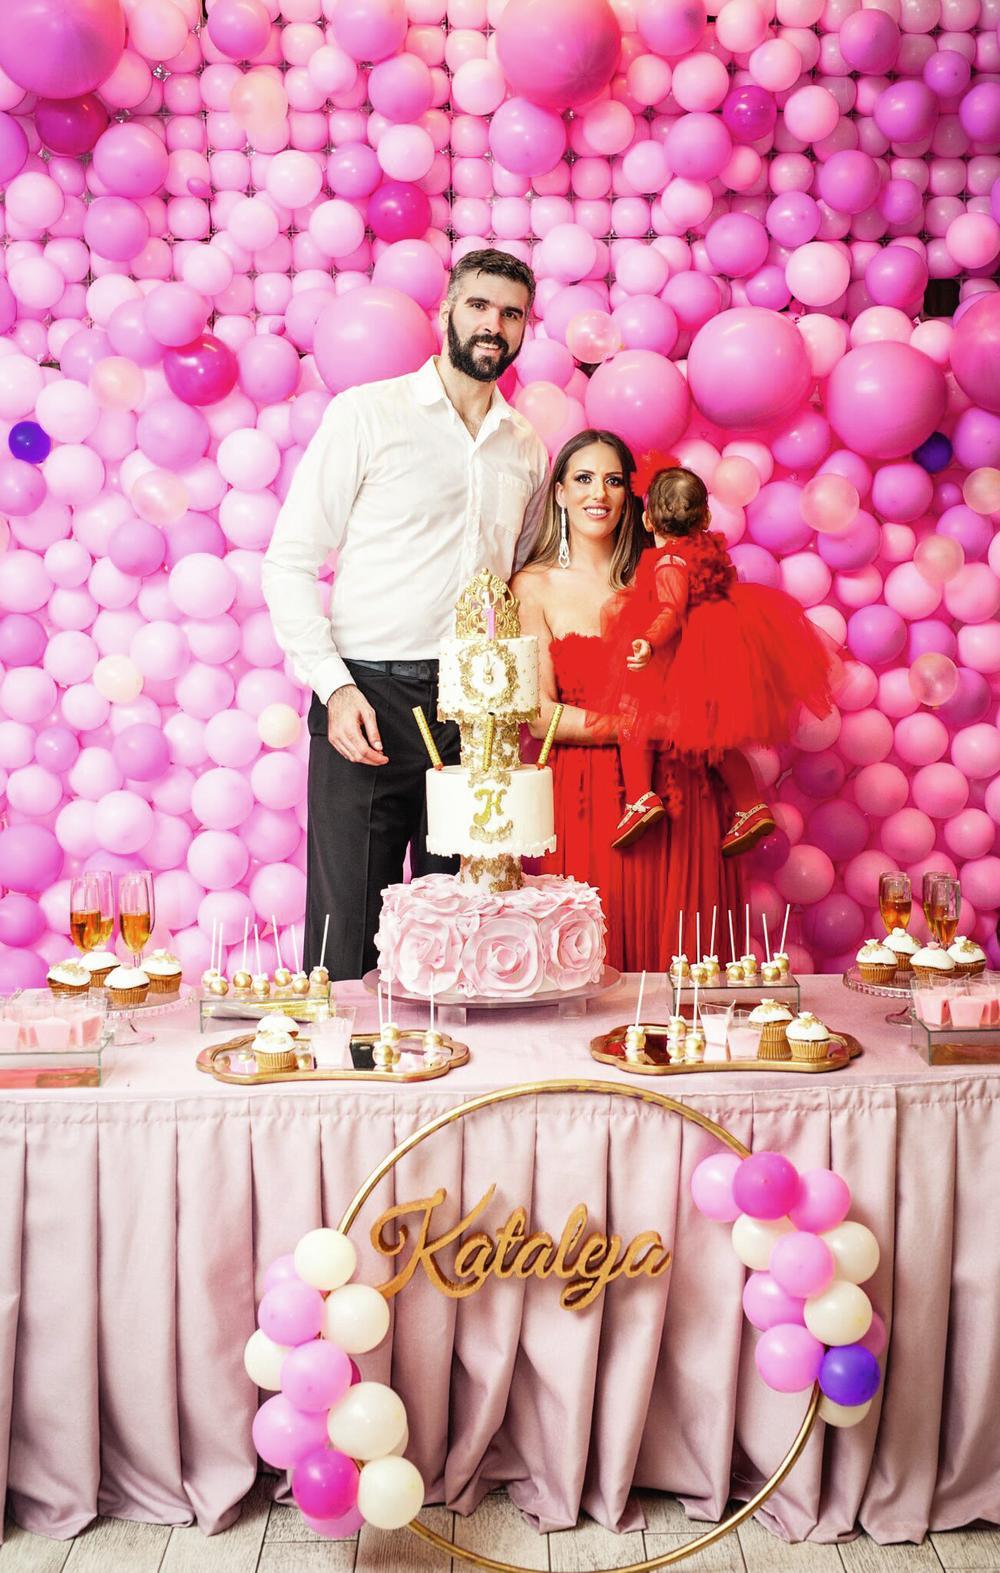 prvi rodjendan Tamara i Slavko Vraneš obeležili prvi rođendan mezimice: U  prvi rodjendan